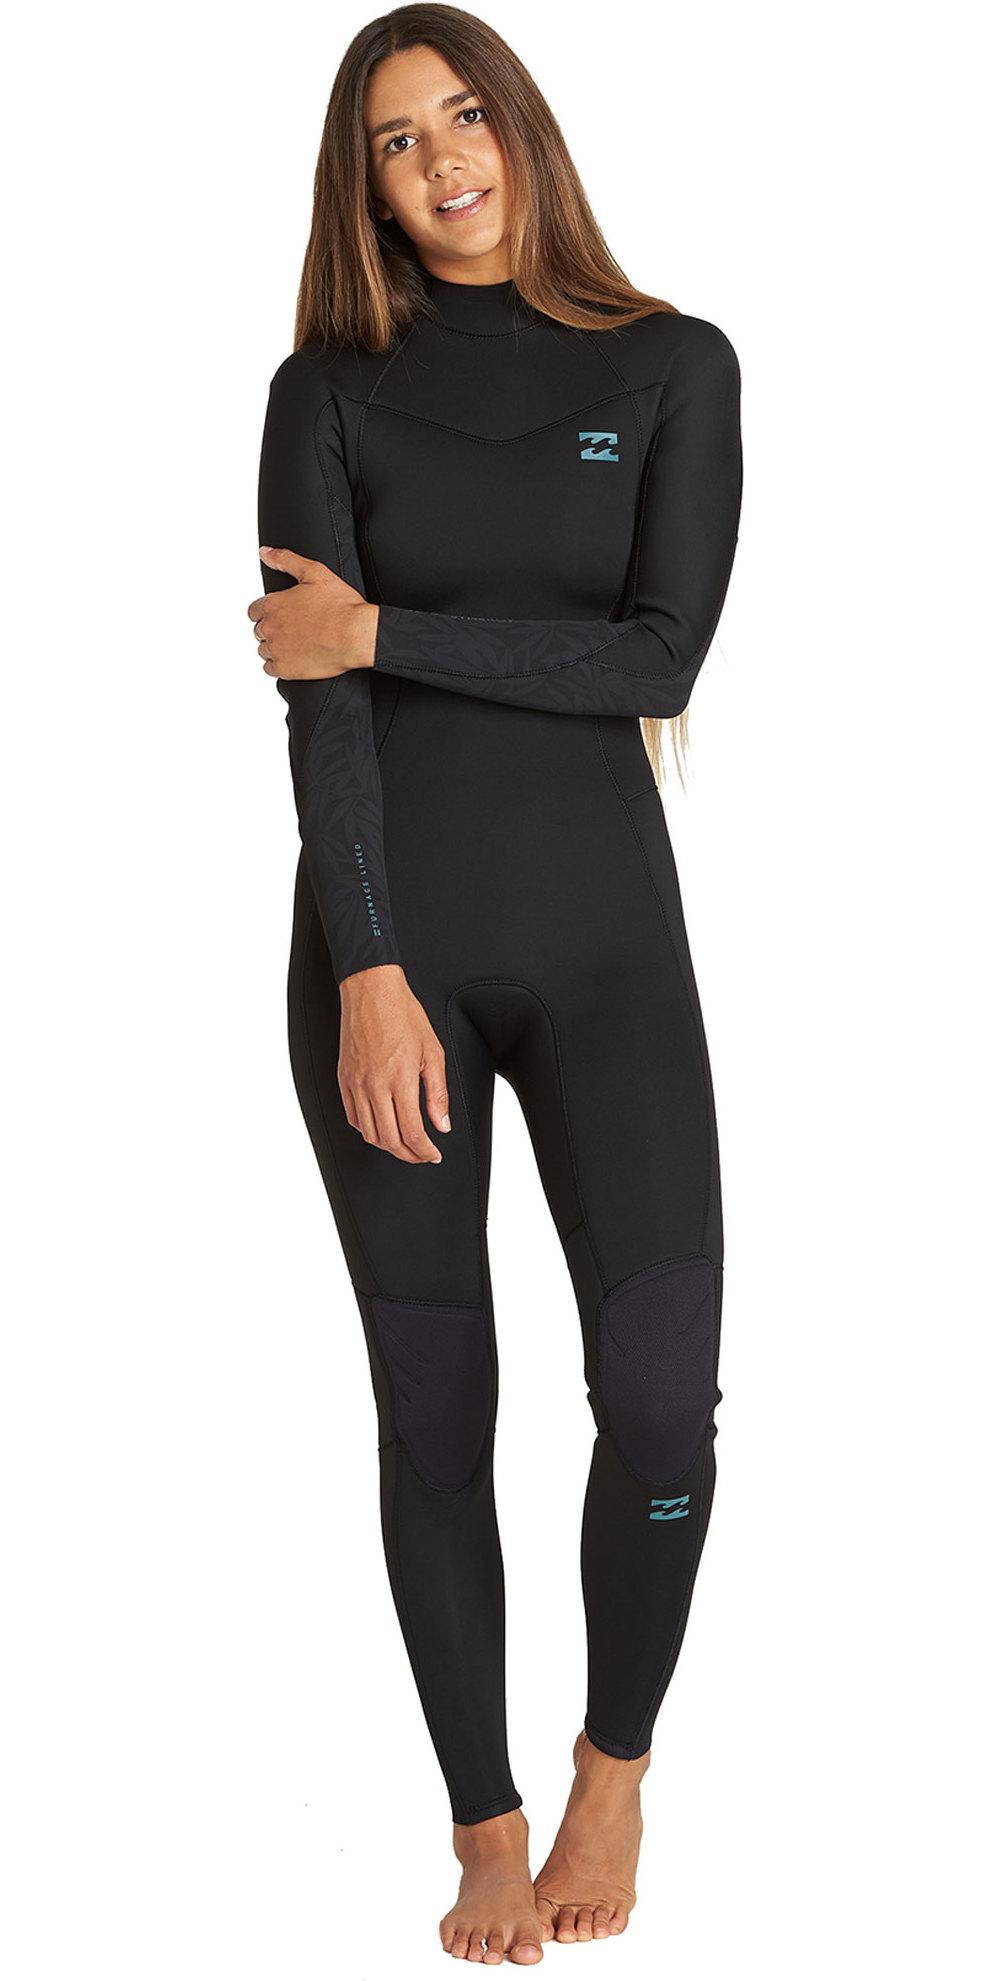 2019 Billabong Womens Furnace Synergy 3/2mm Back Zip Wetsuit Black Q43G04